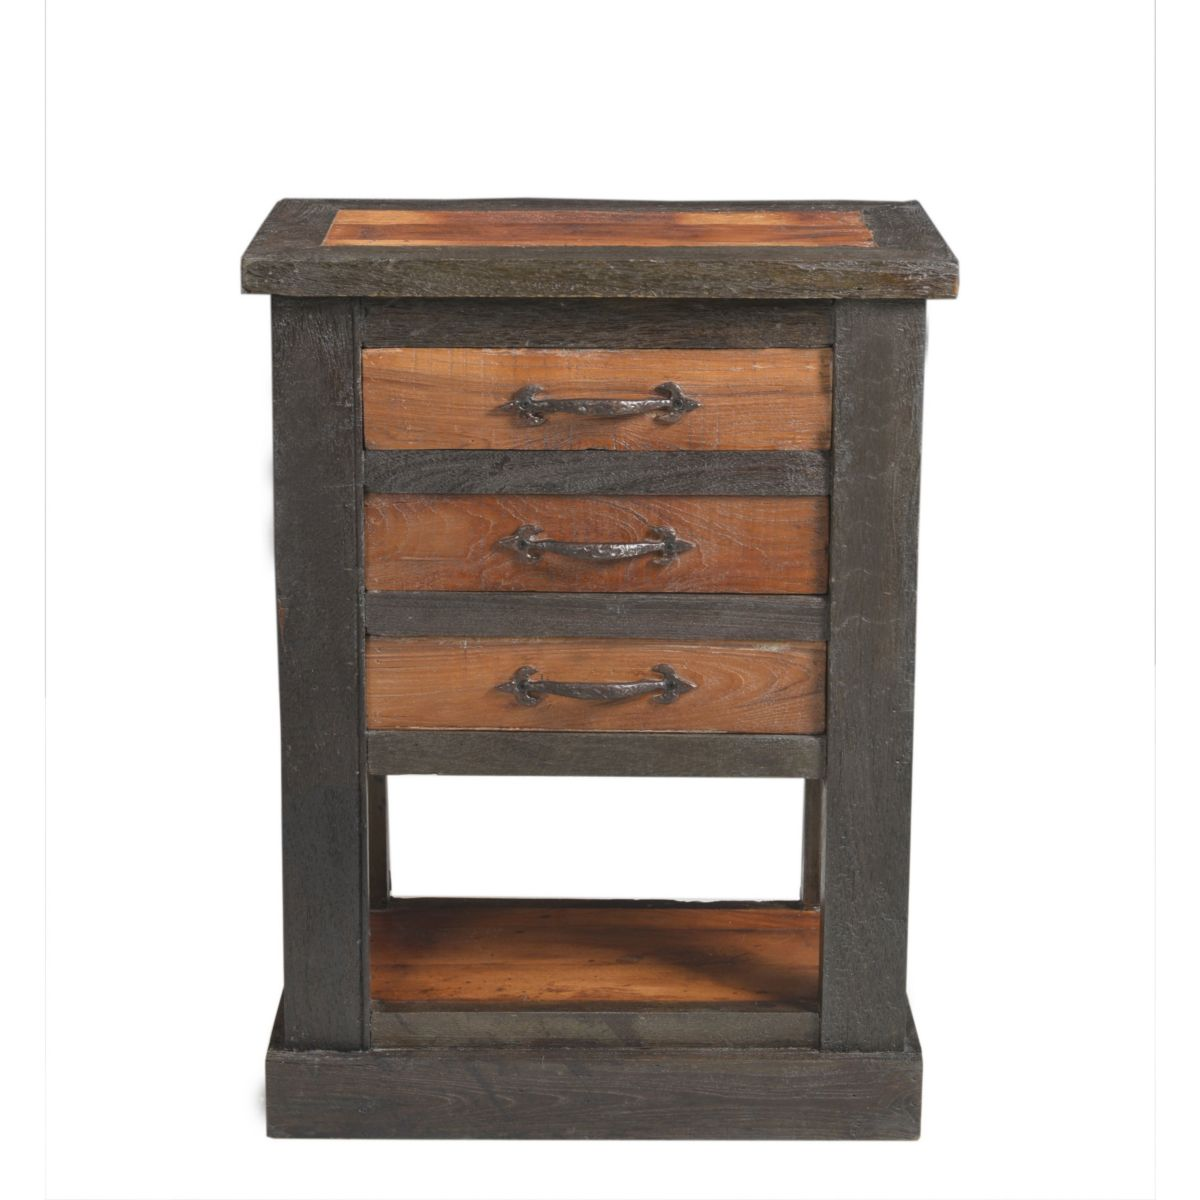 Telefontisch recyceltes Holz natur massiv jetztbilligerkaufen